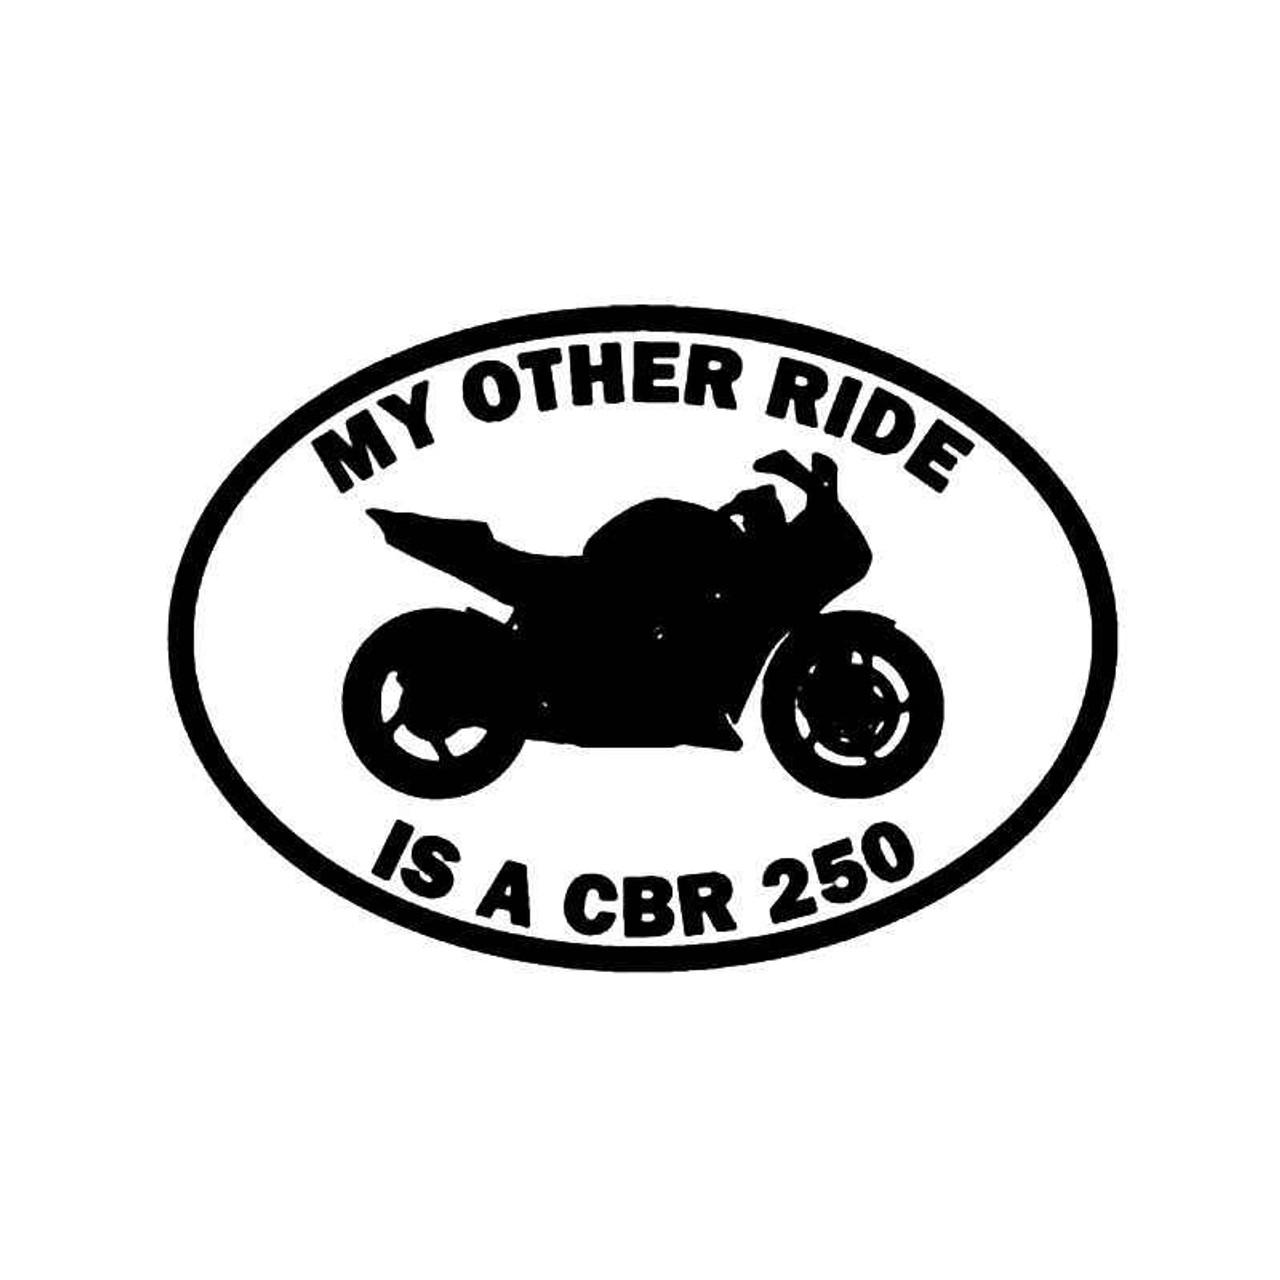 My Other Ride Honda Cbr600rr Motorcycle Vinyl Sticker